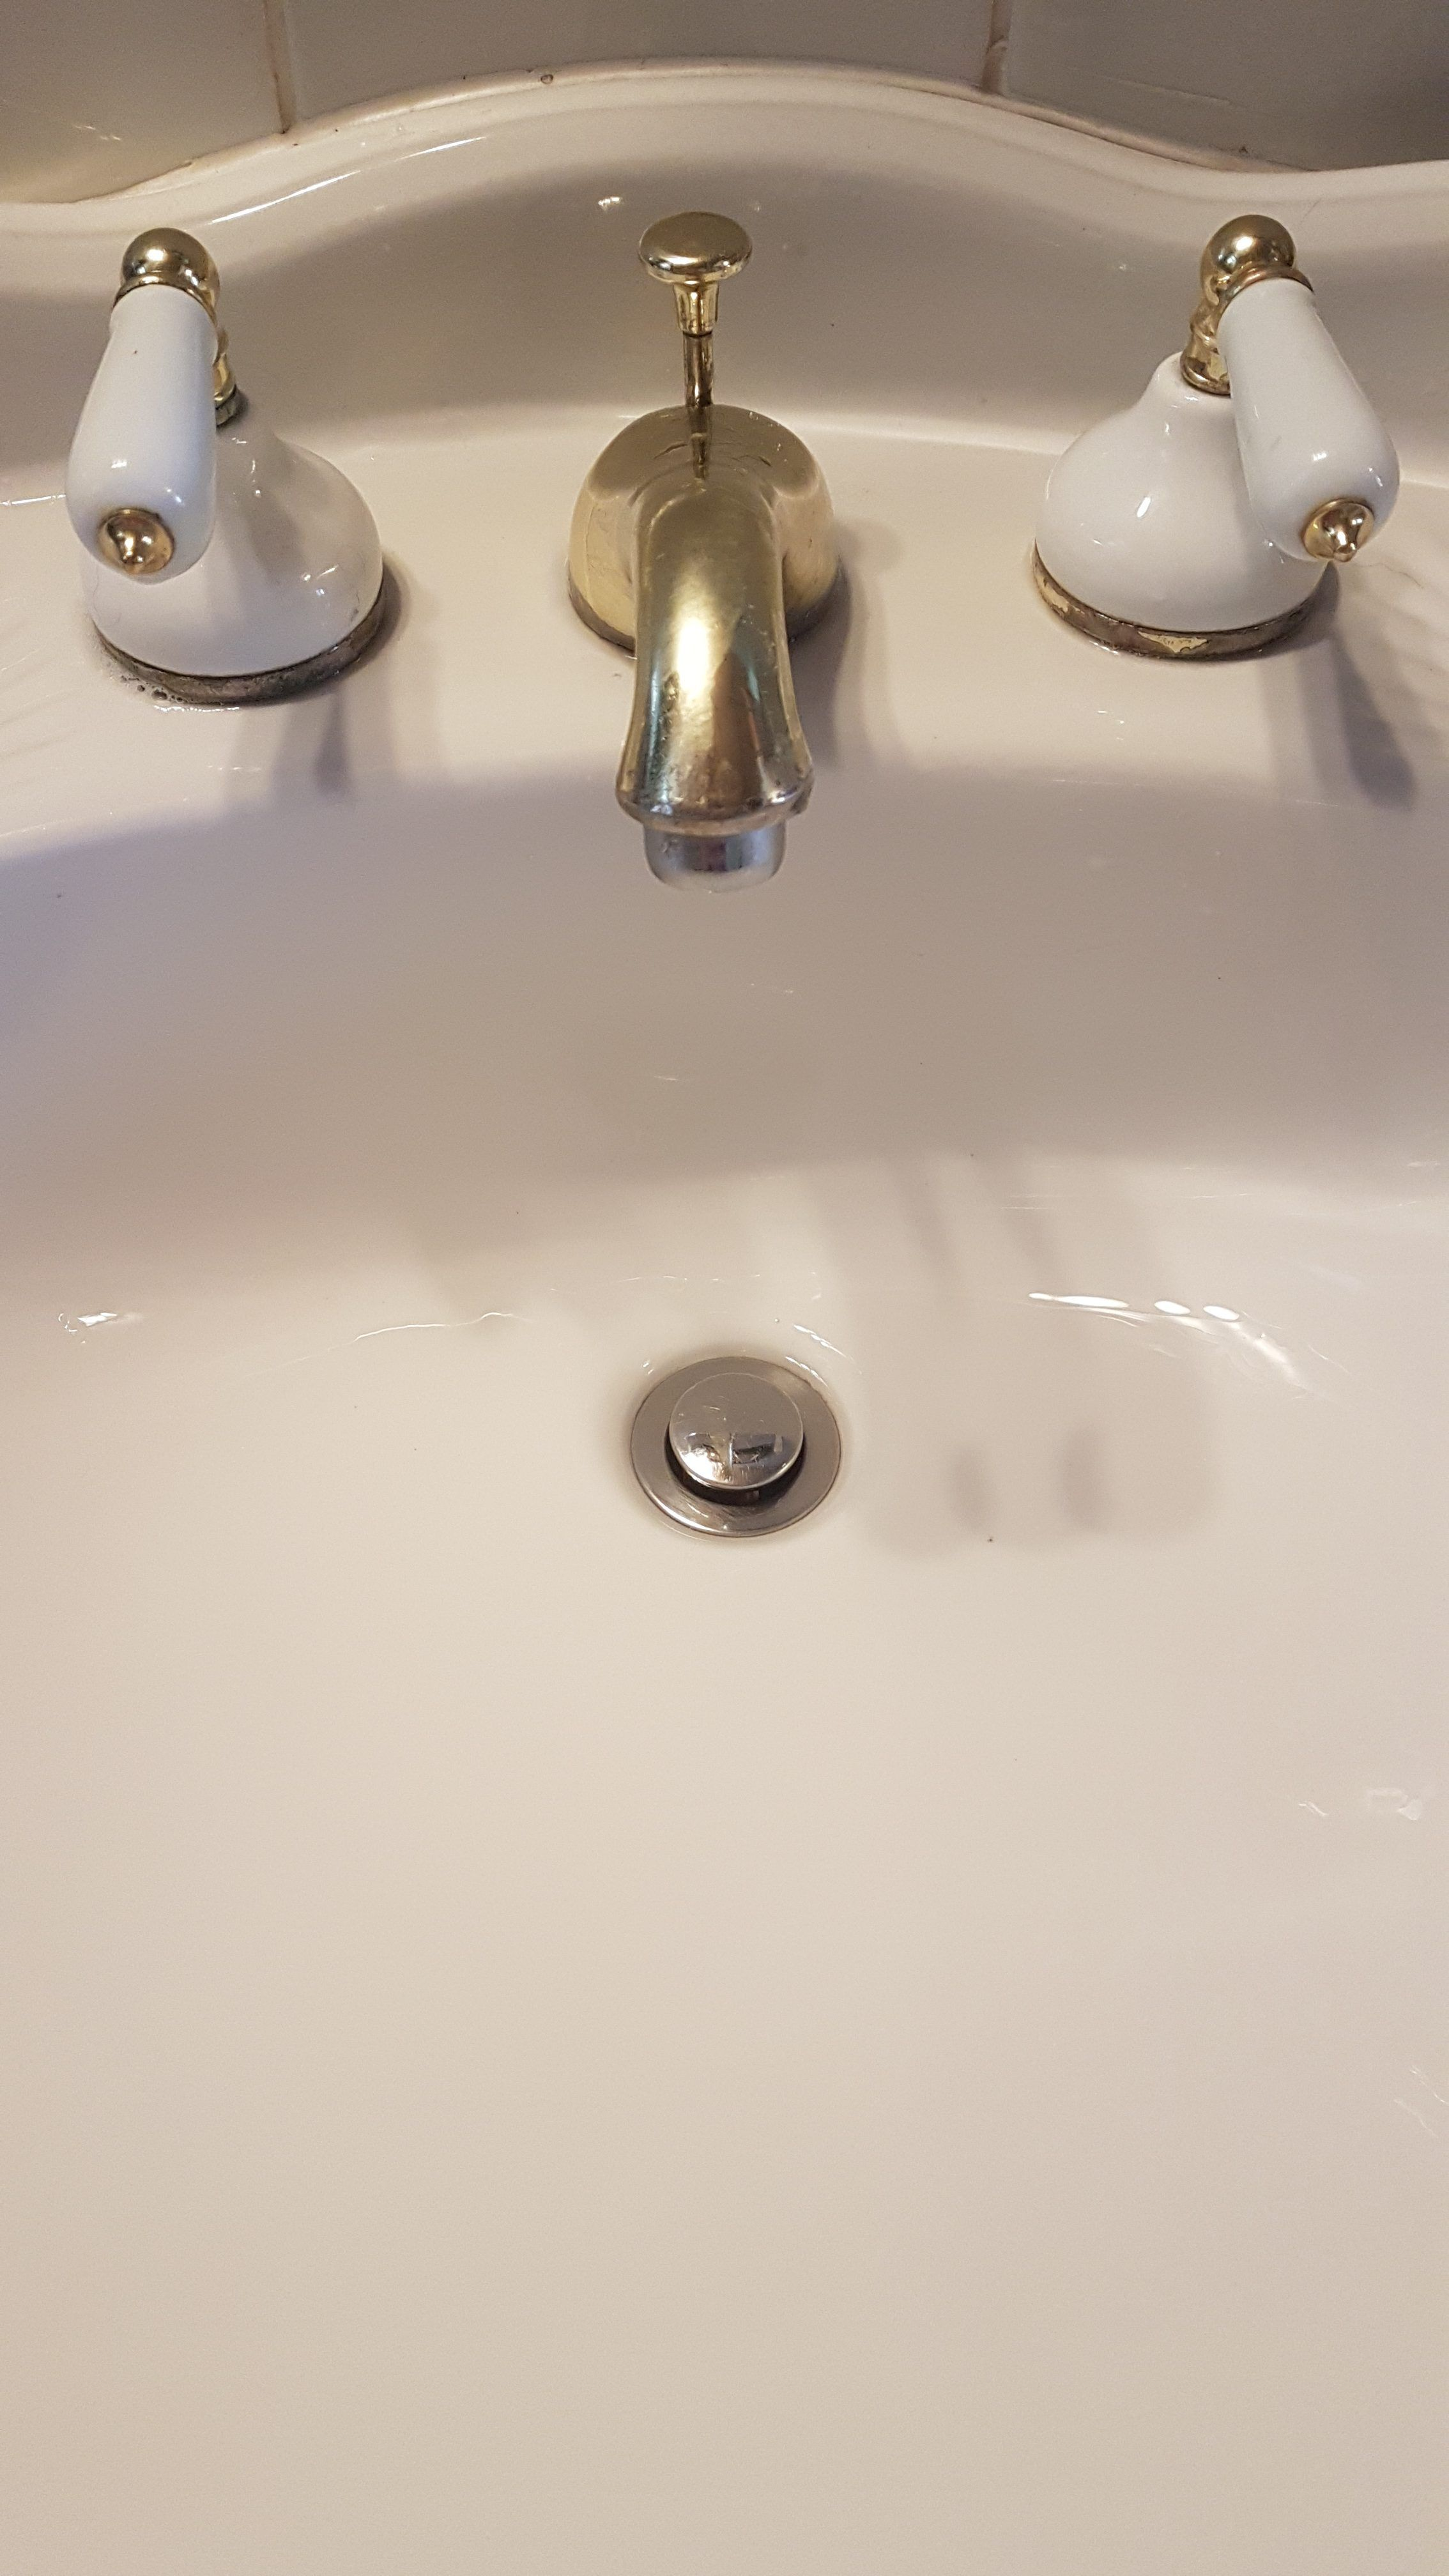 Pin On Bathroom Themes